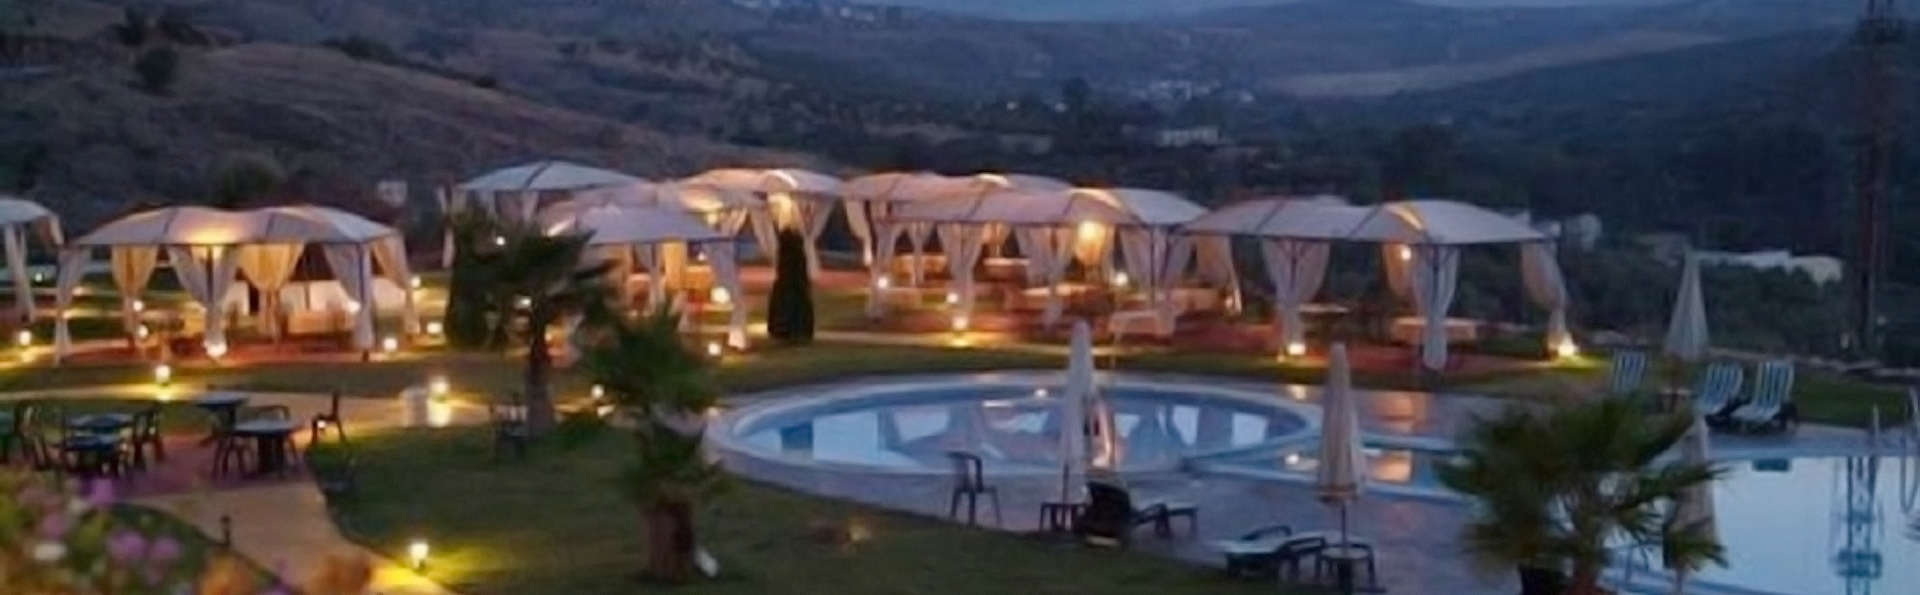 Hotel Almazara - edit_garden_night.jpg